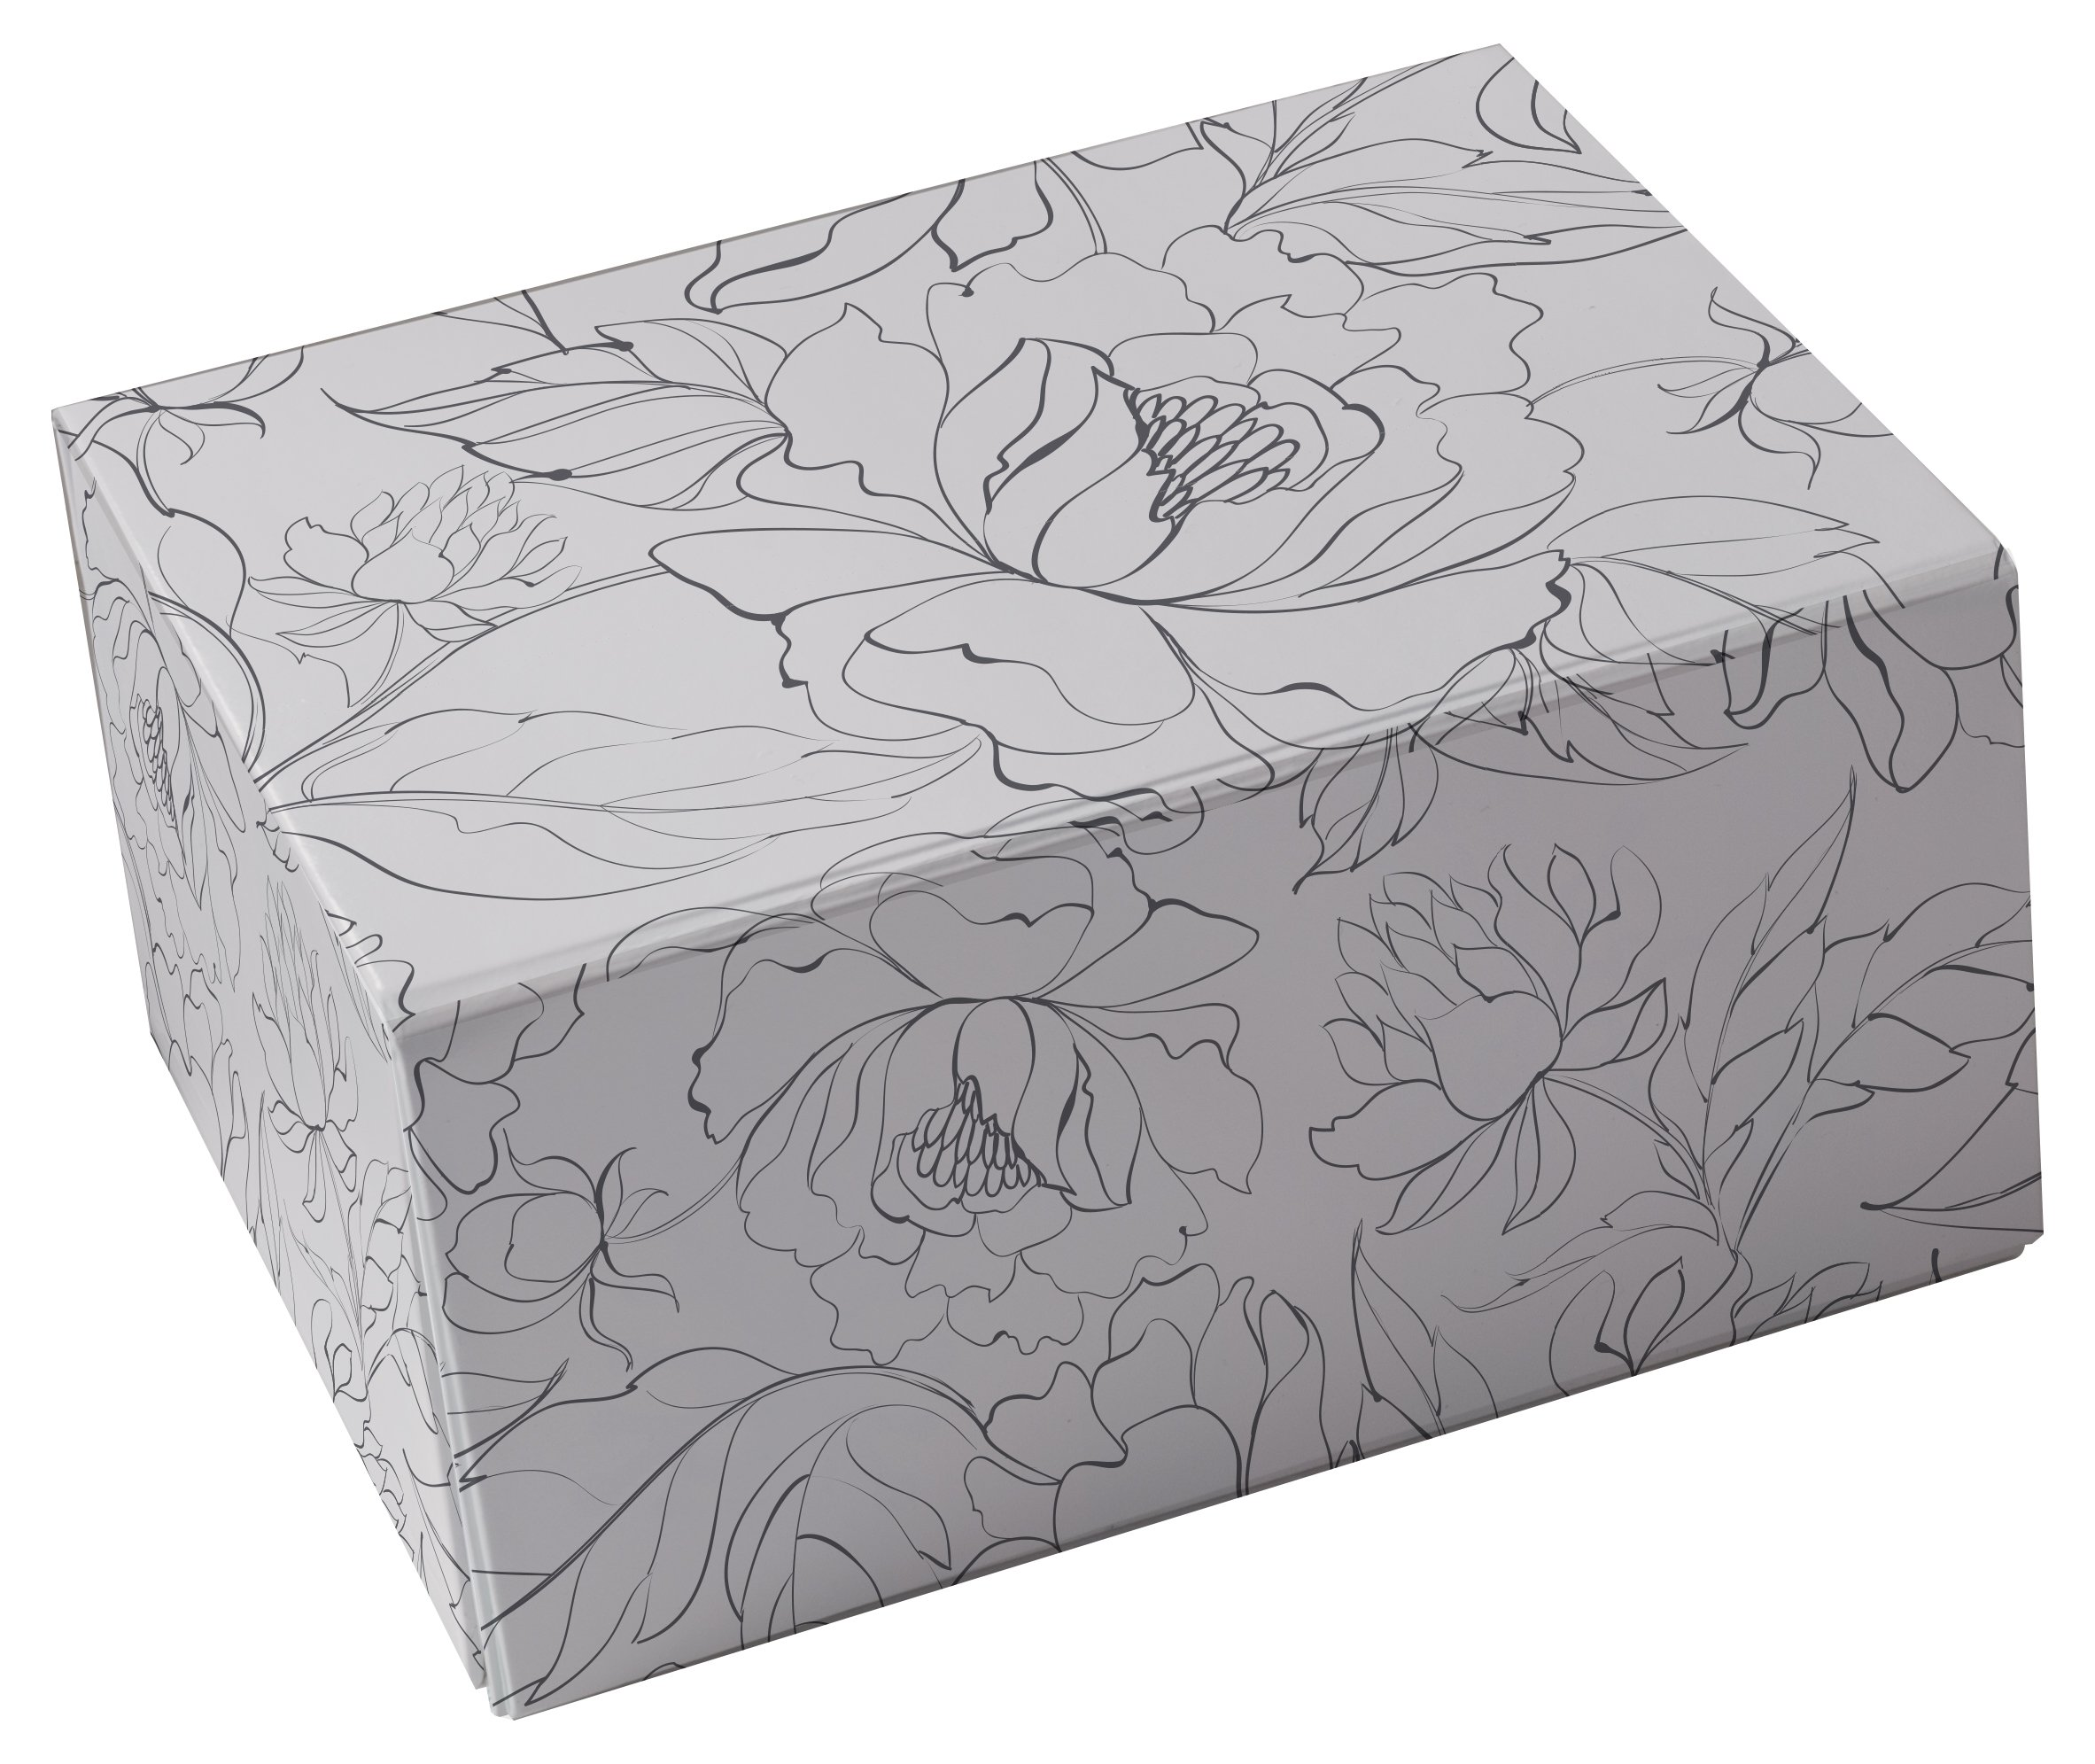 Snap-N-Store Storage Box 3-Piece Set, Small/Medium/Large, Hand Drawn Floral (SNS03327)